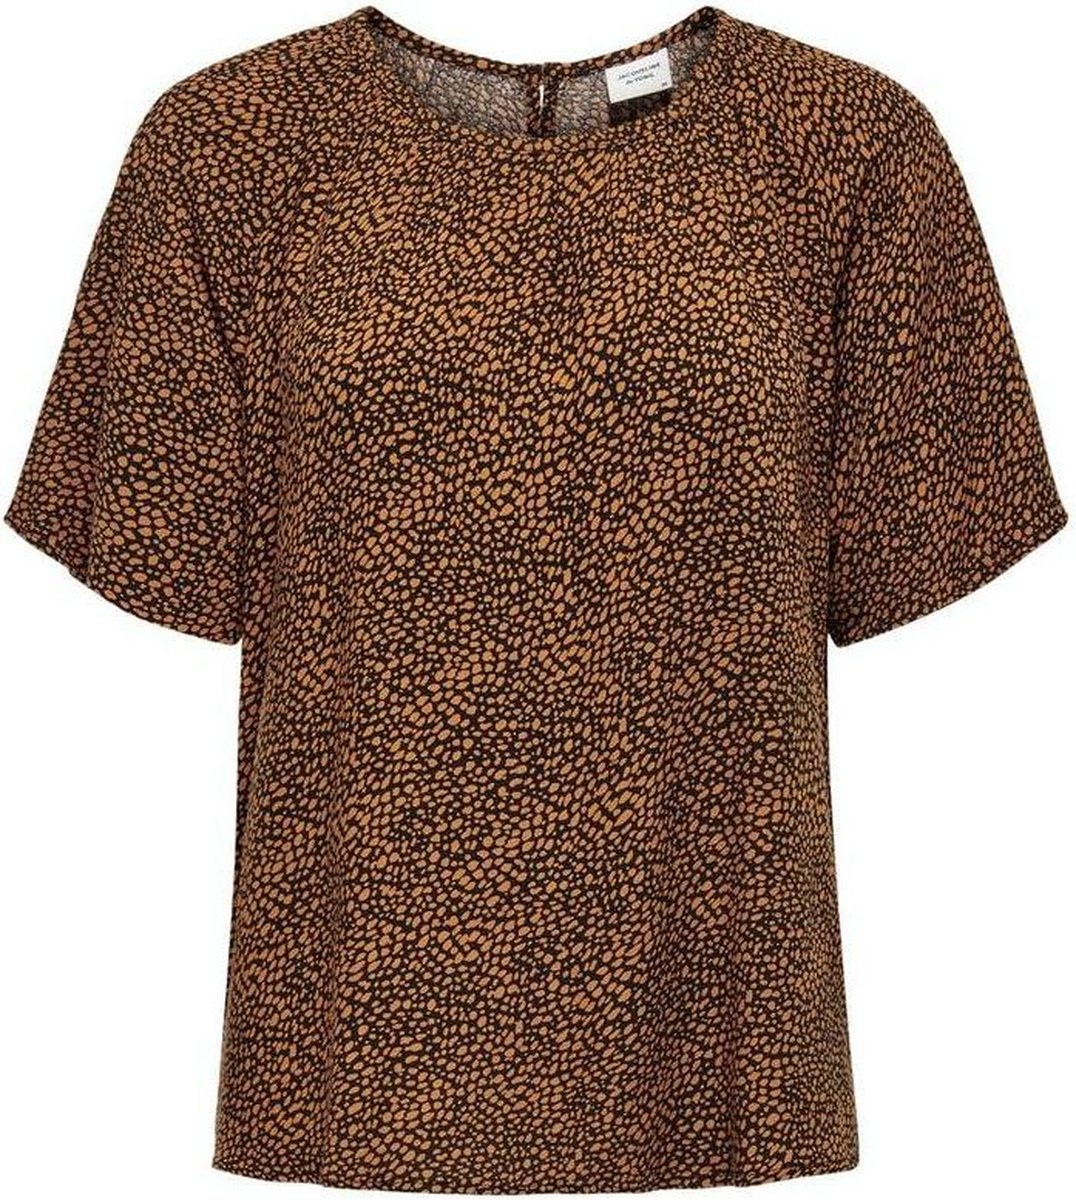 Jdypearl S/s Top Wvn 15209000 Black/leather Brown